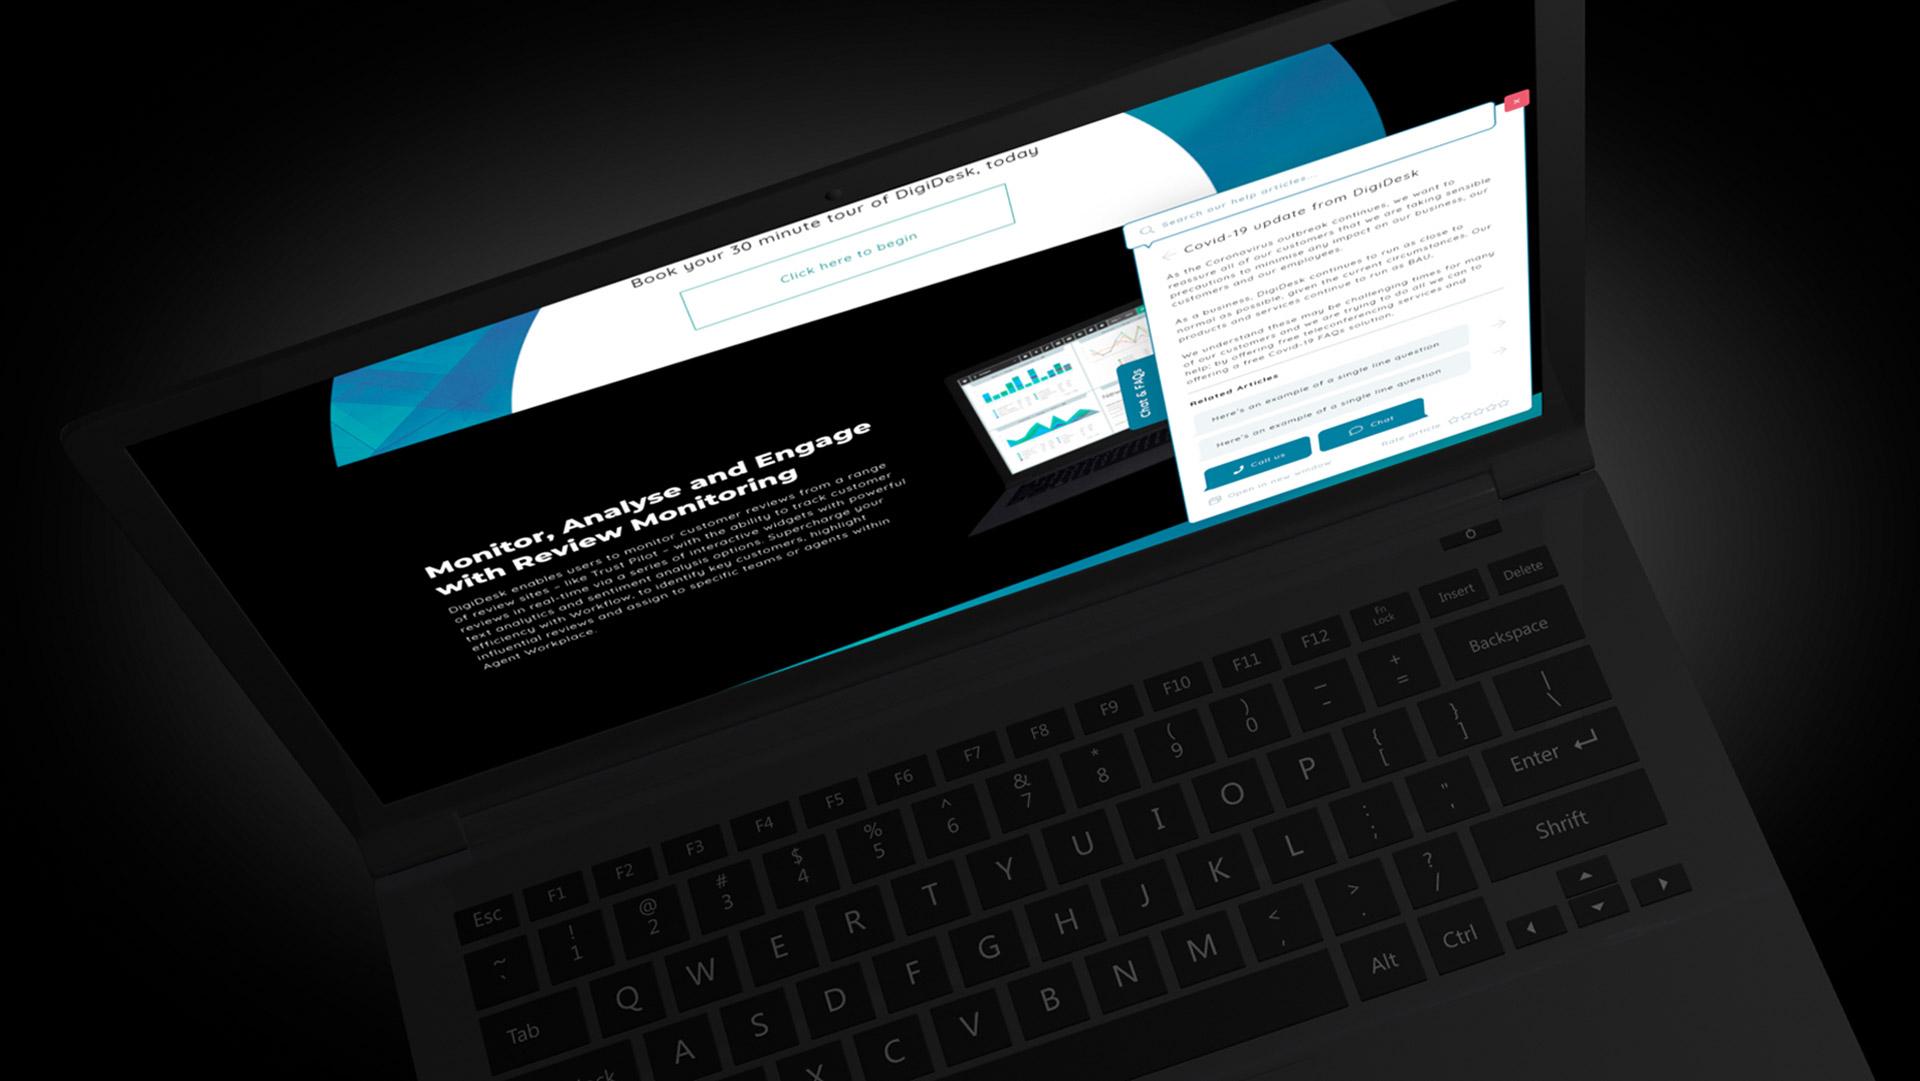 An angular view of DigiDesk's customer facing Dynamic FAQs tab